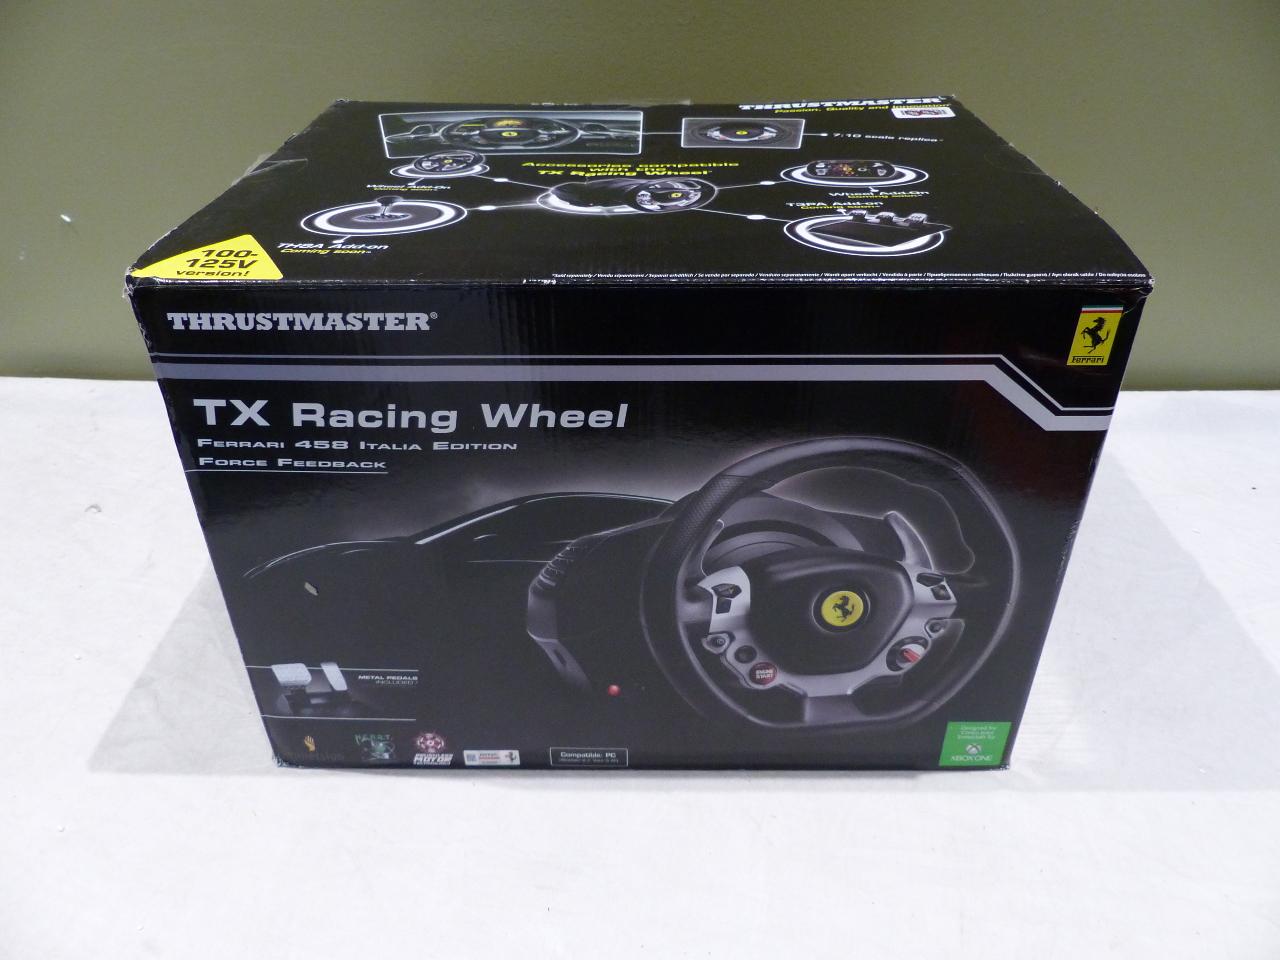 thrustmaster ferrari 458 italia edition tx racing wheel ferrari for xbox one 663296419286 ebay. Black Bedroom Furniture Sets. Home Design Ideas